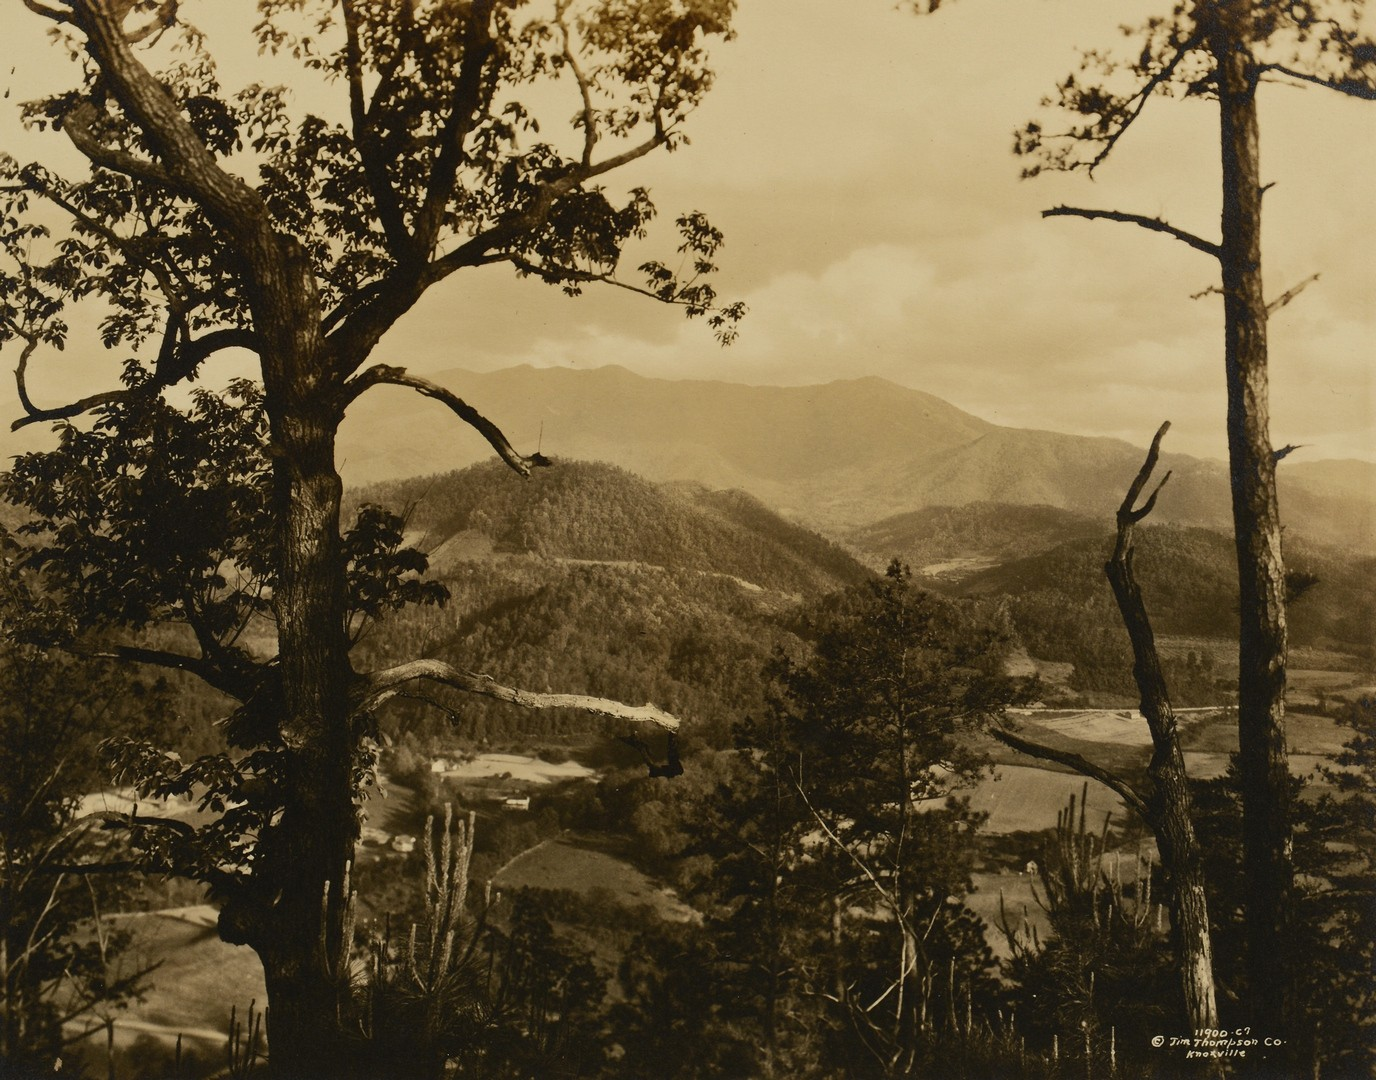 Lot 189: 3 Vintage Great Smoky Mtns. Photos, Jim Thompson